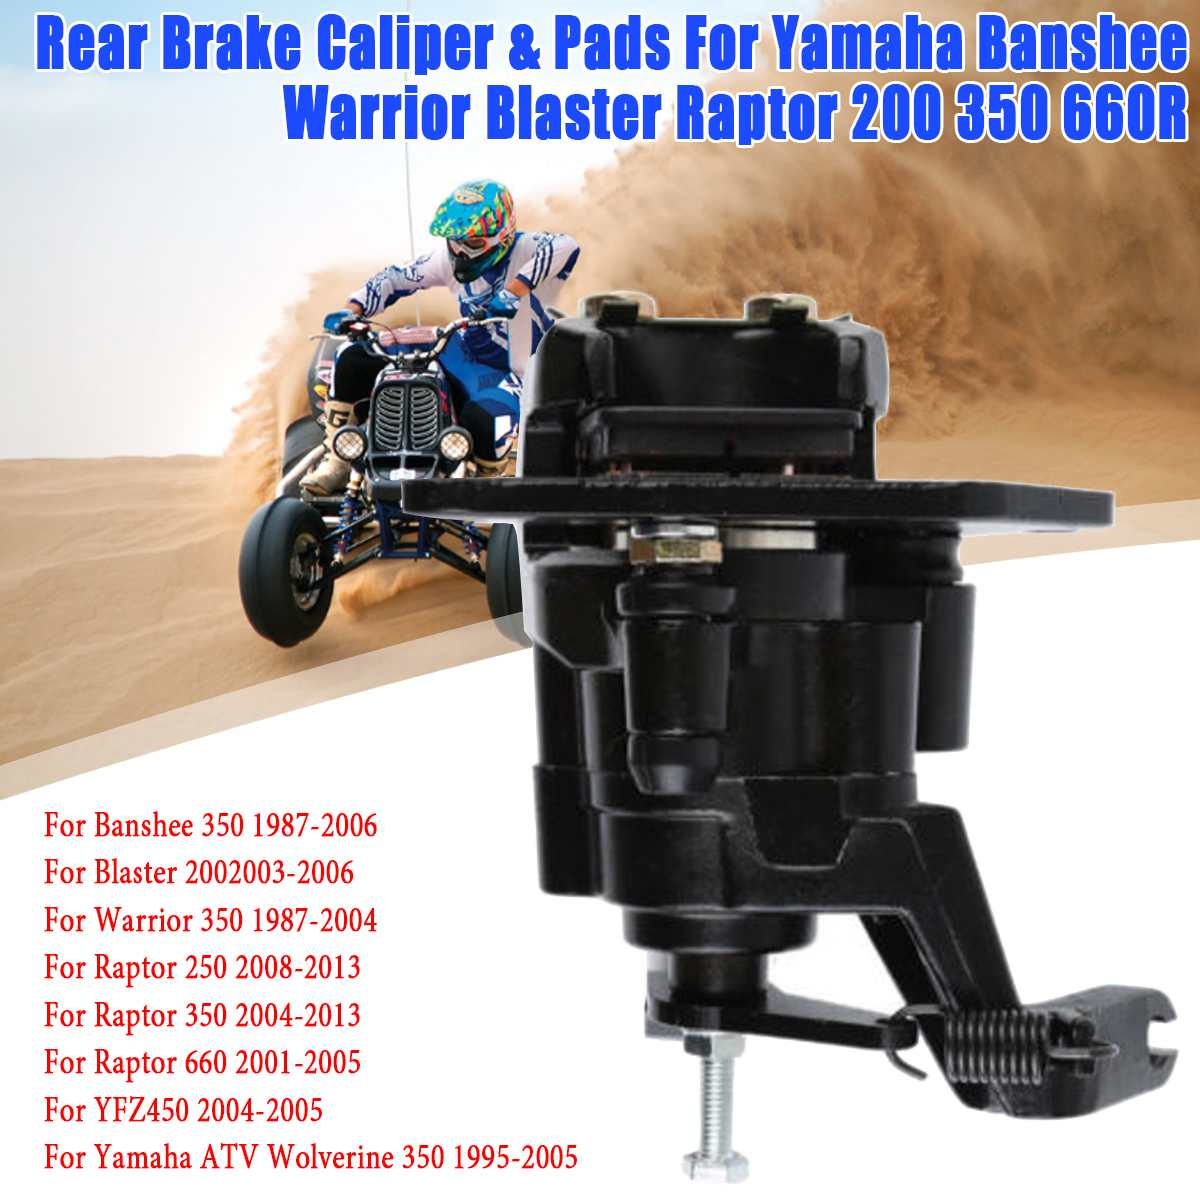 REAR HYDRAULIC BRAKE CALIPER ASSEMBLY FOR YAMAHA BANSHEE 350 1987-2006 YFZ350